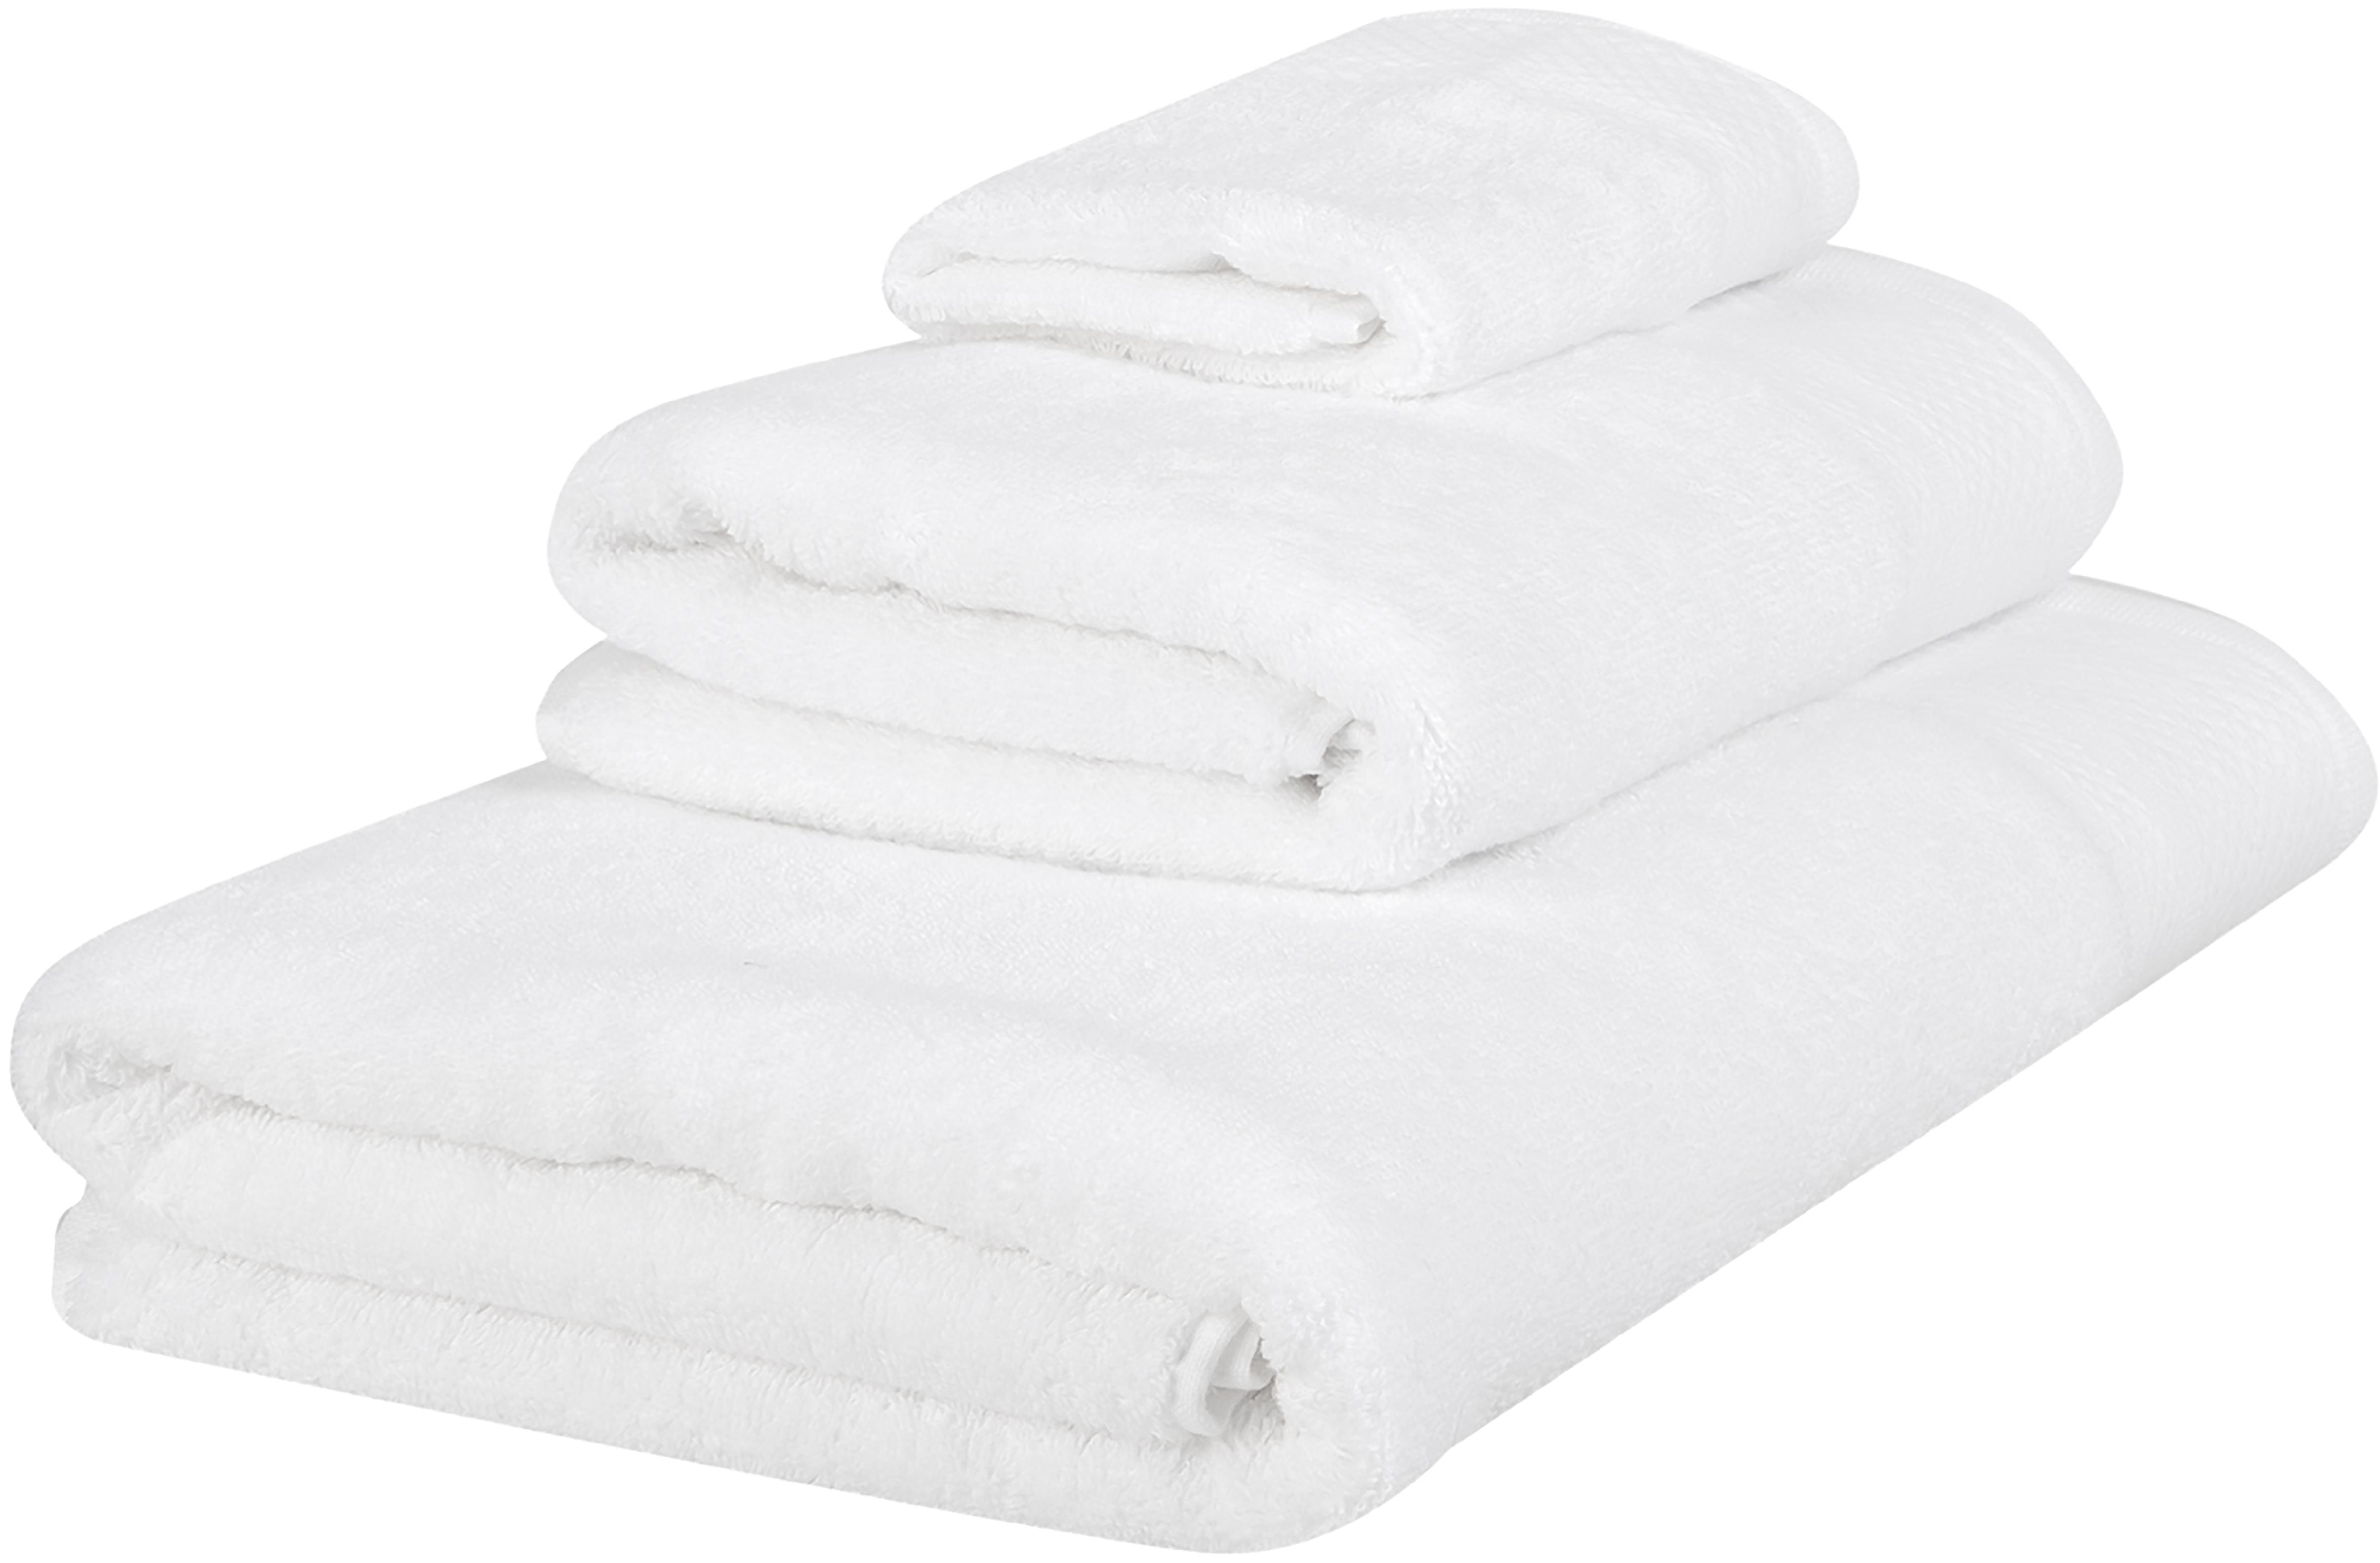 Set de toallas Premium, 3pzas., 100%algodón Gramaje superior 600g/m², Blanco, Set de diferentes tamaños